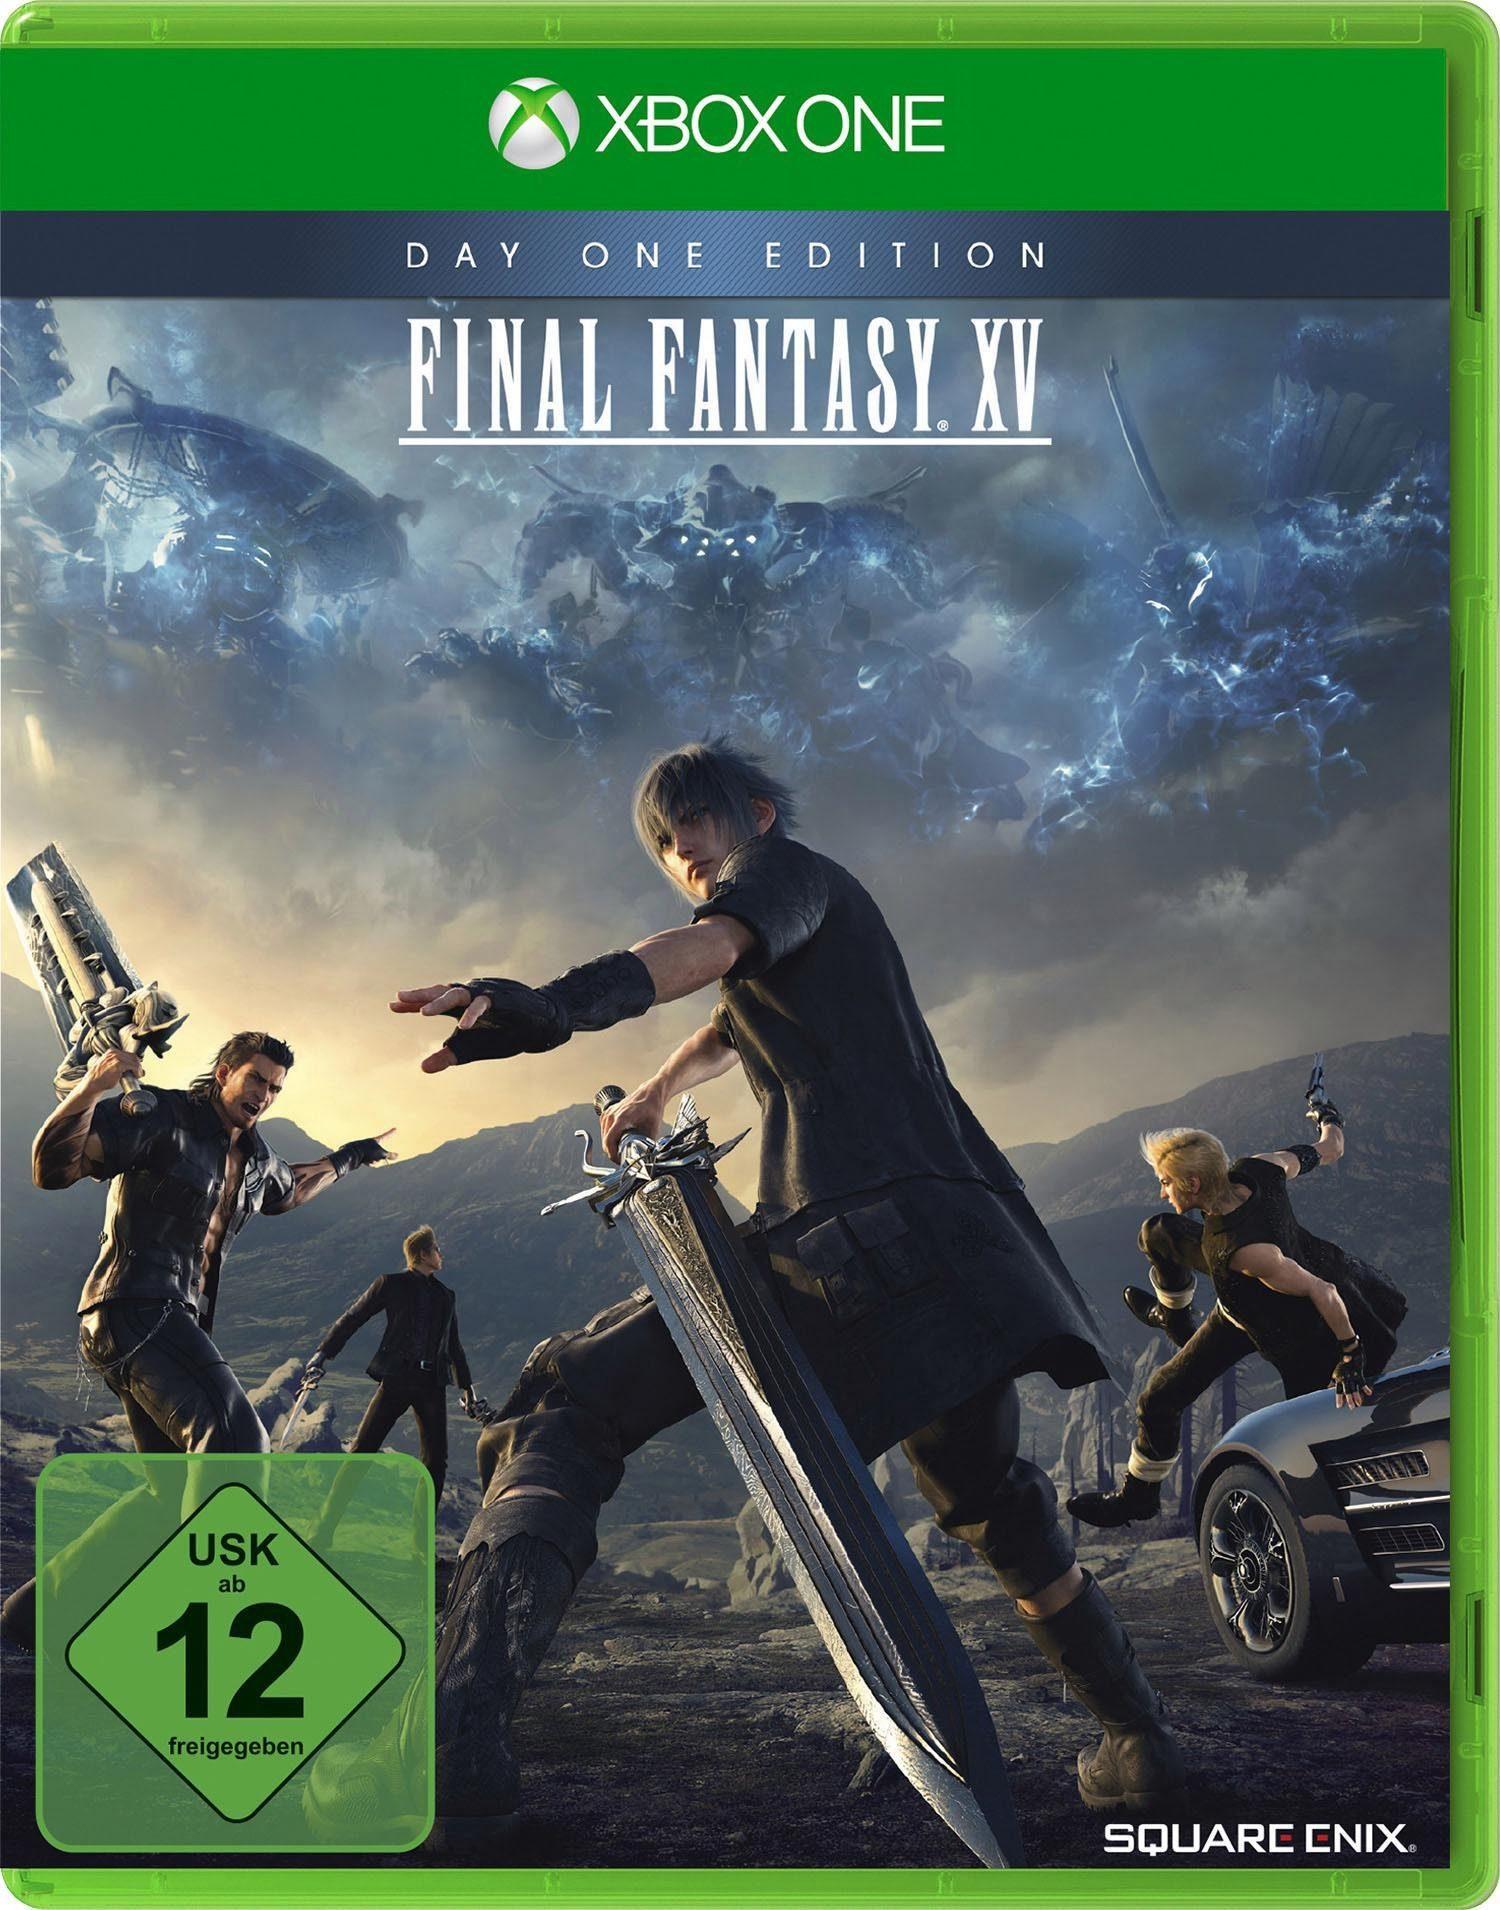 Sammlung Hier Final Fantasy Xiii Plüschfigur Lightning 14 Cm VerrüCkter Preis Aufsteller & Figuren Filme & Dvds